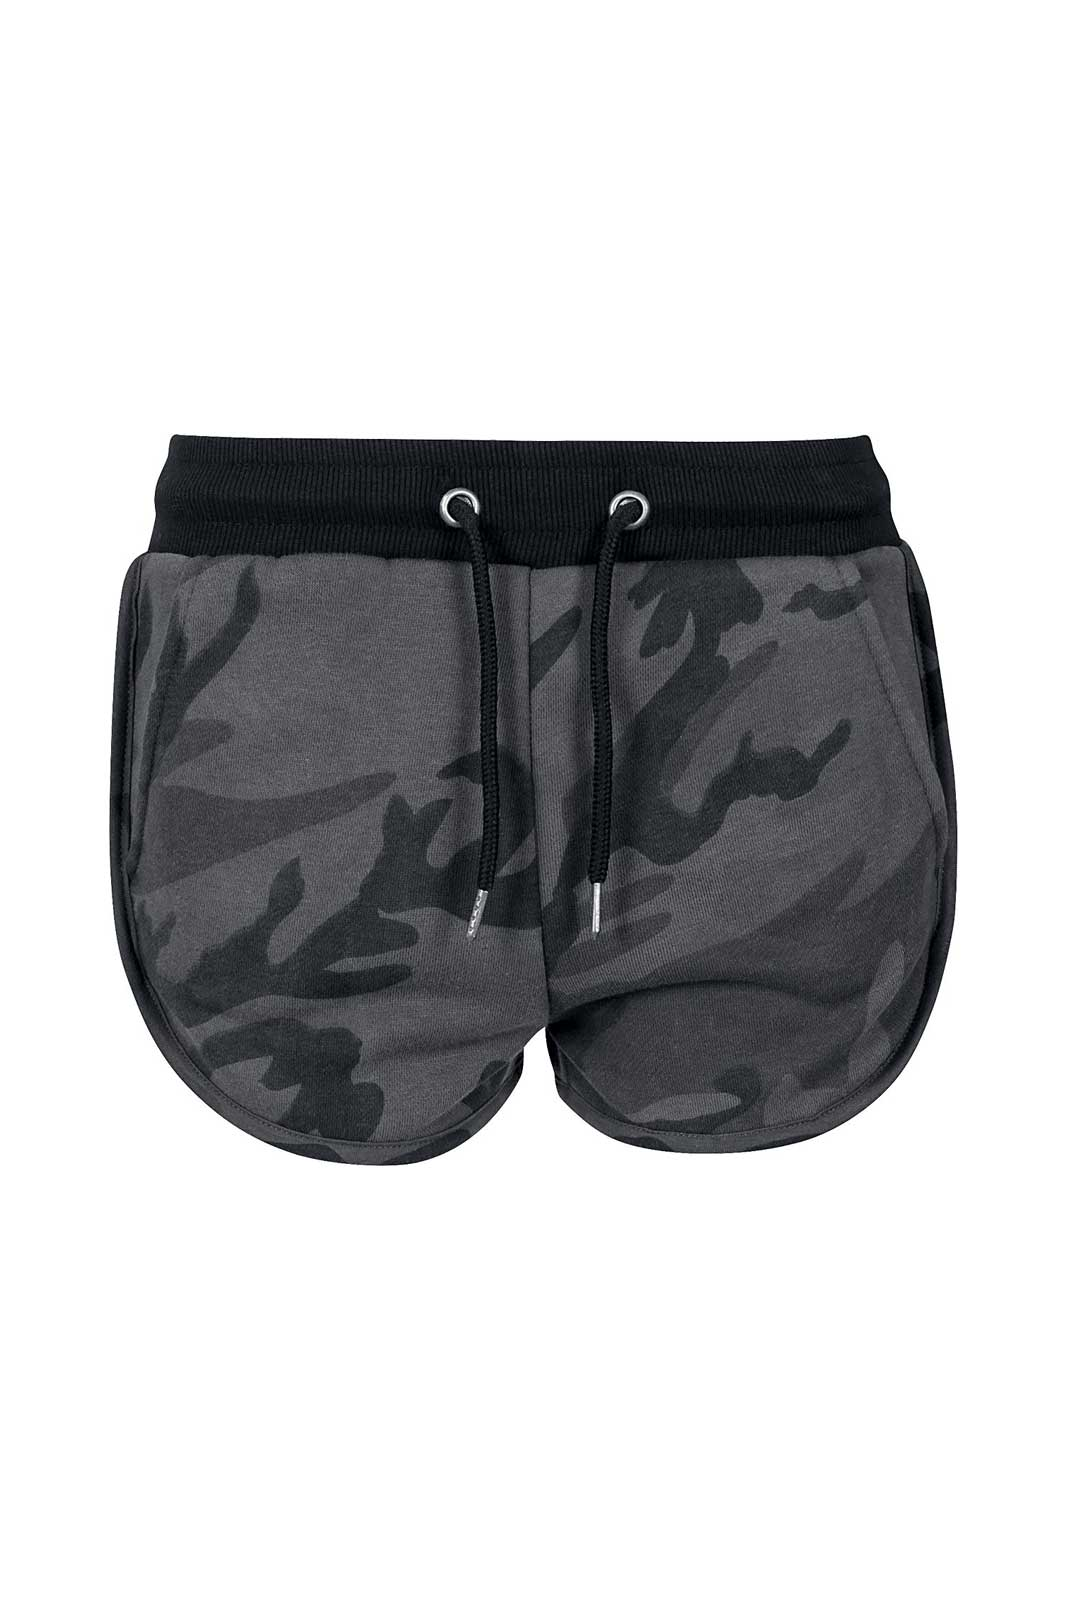 Camo Hotpants Camo